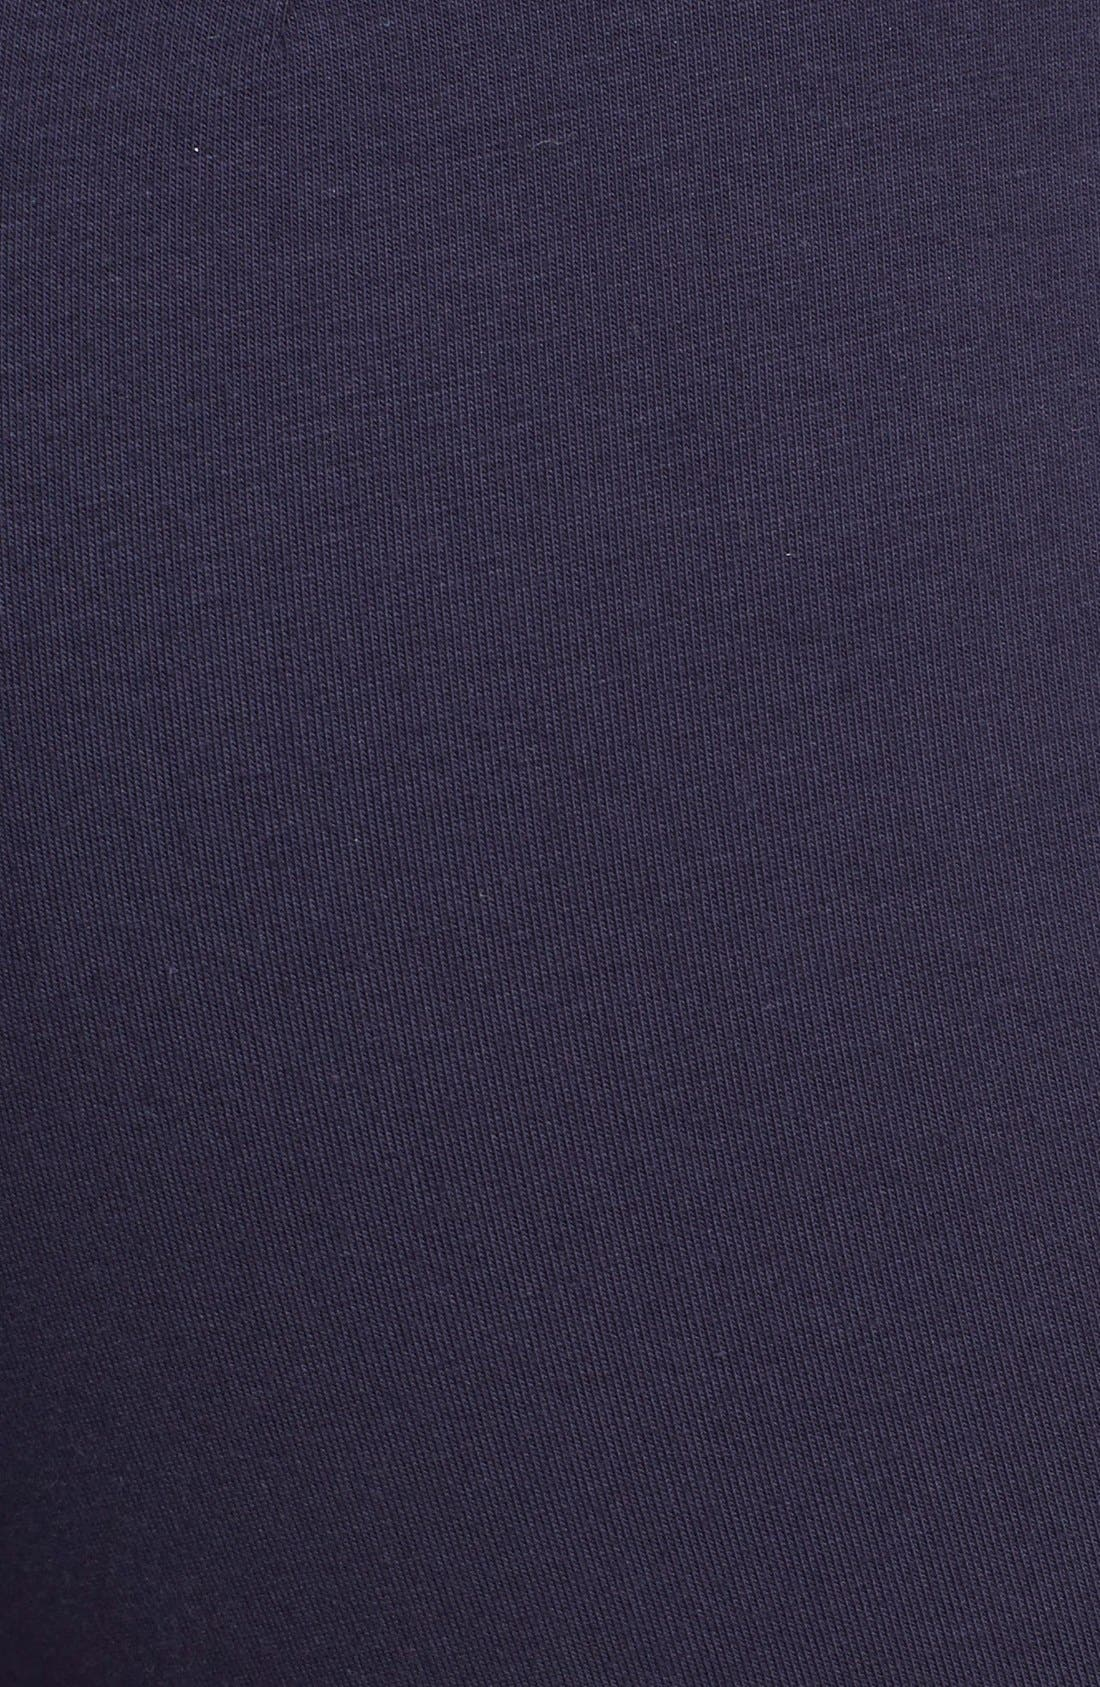 Stretch Knit Skinny Pants,                             Alternate thumbnail 4, color,